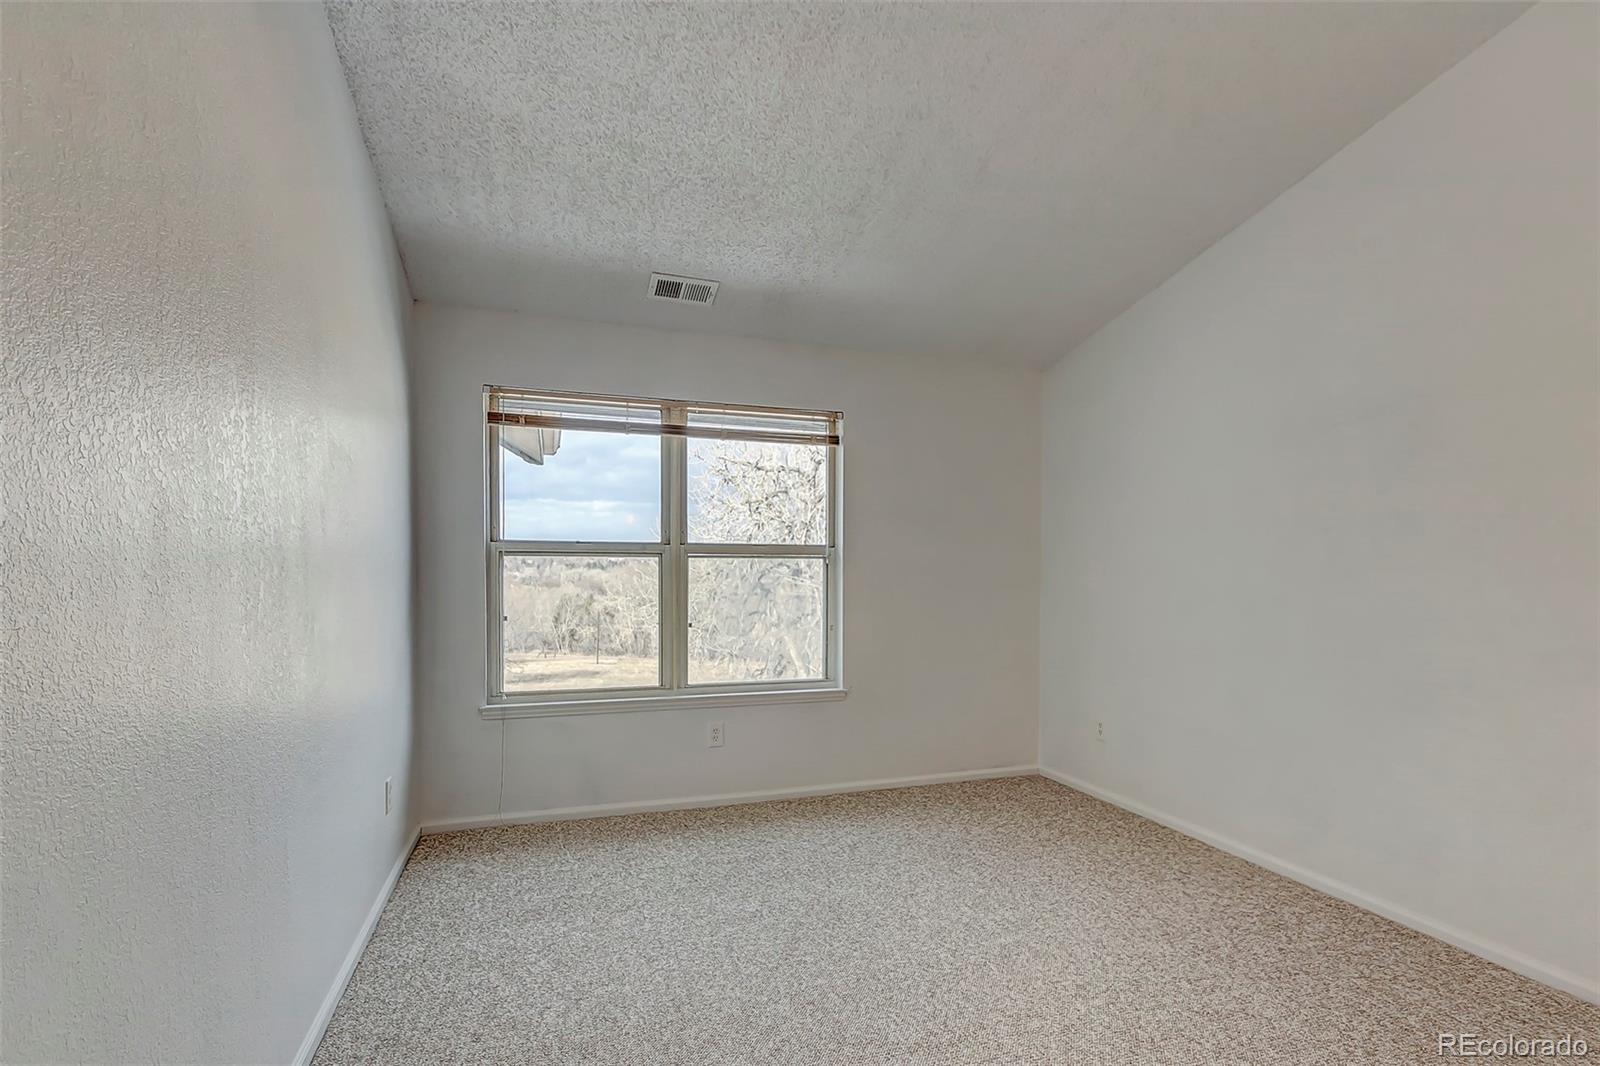 MLS# 3356784 - 19 - 8035 W Eastman Place #306, Lakewood, CO 80227